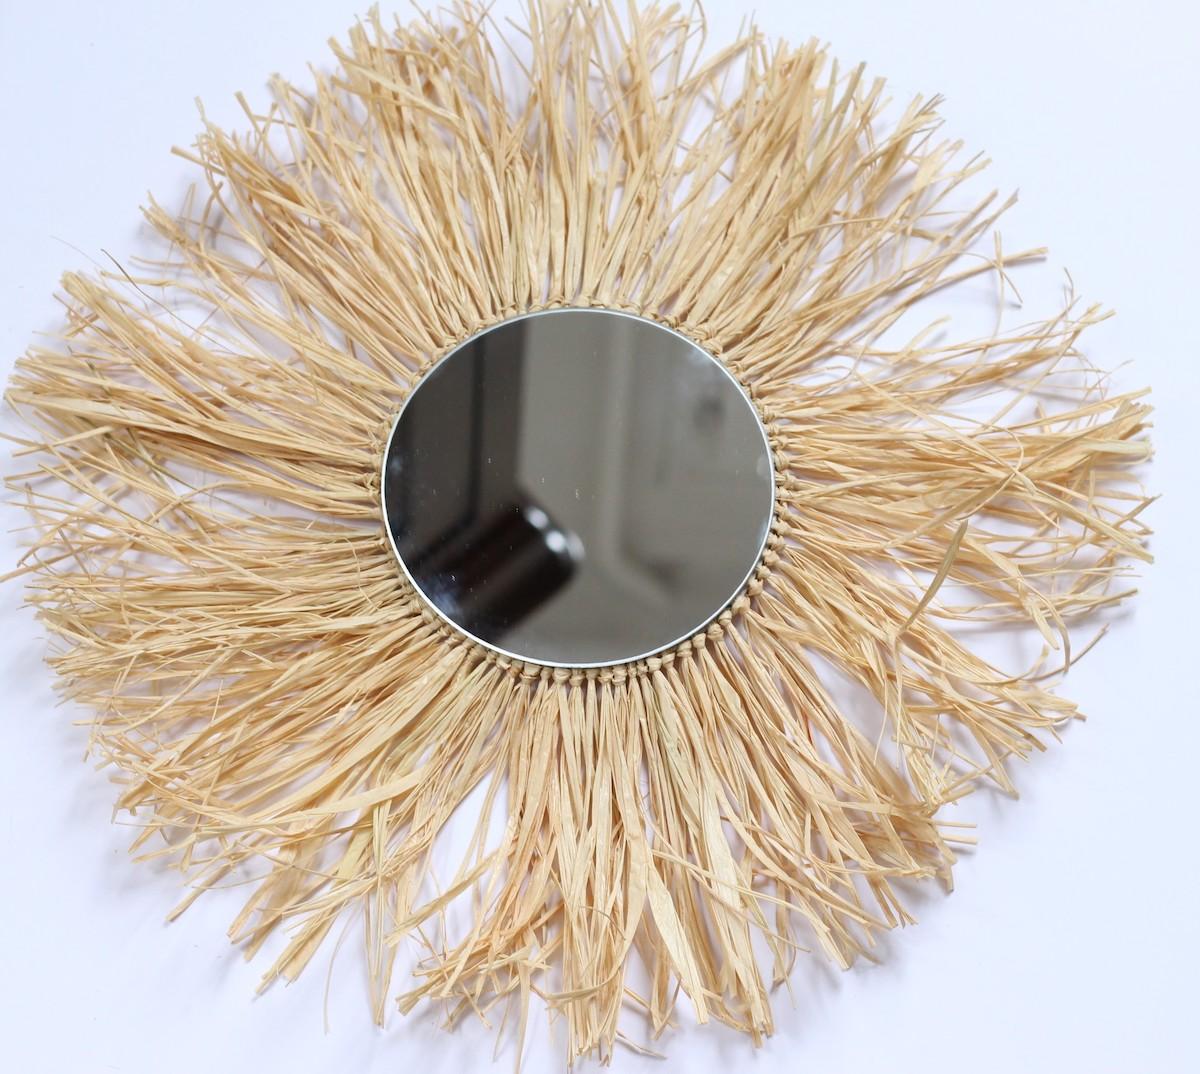 tuto diy miroir en raphia fibre bambou fait-maison